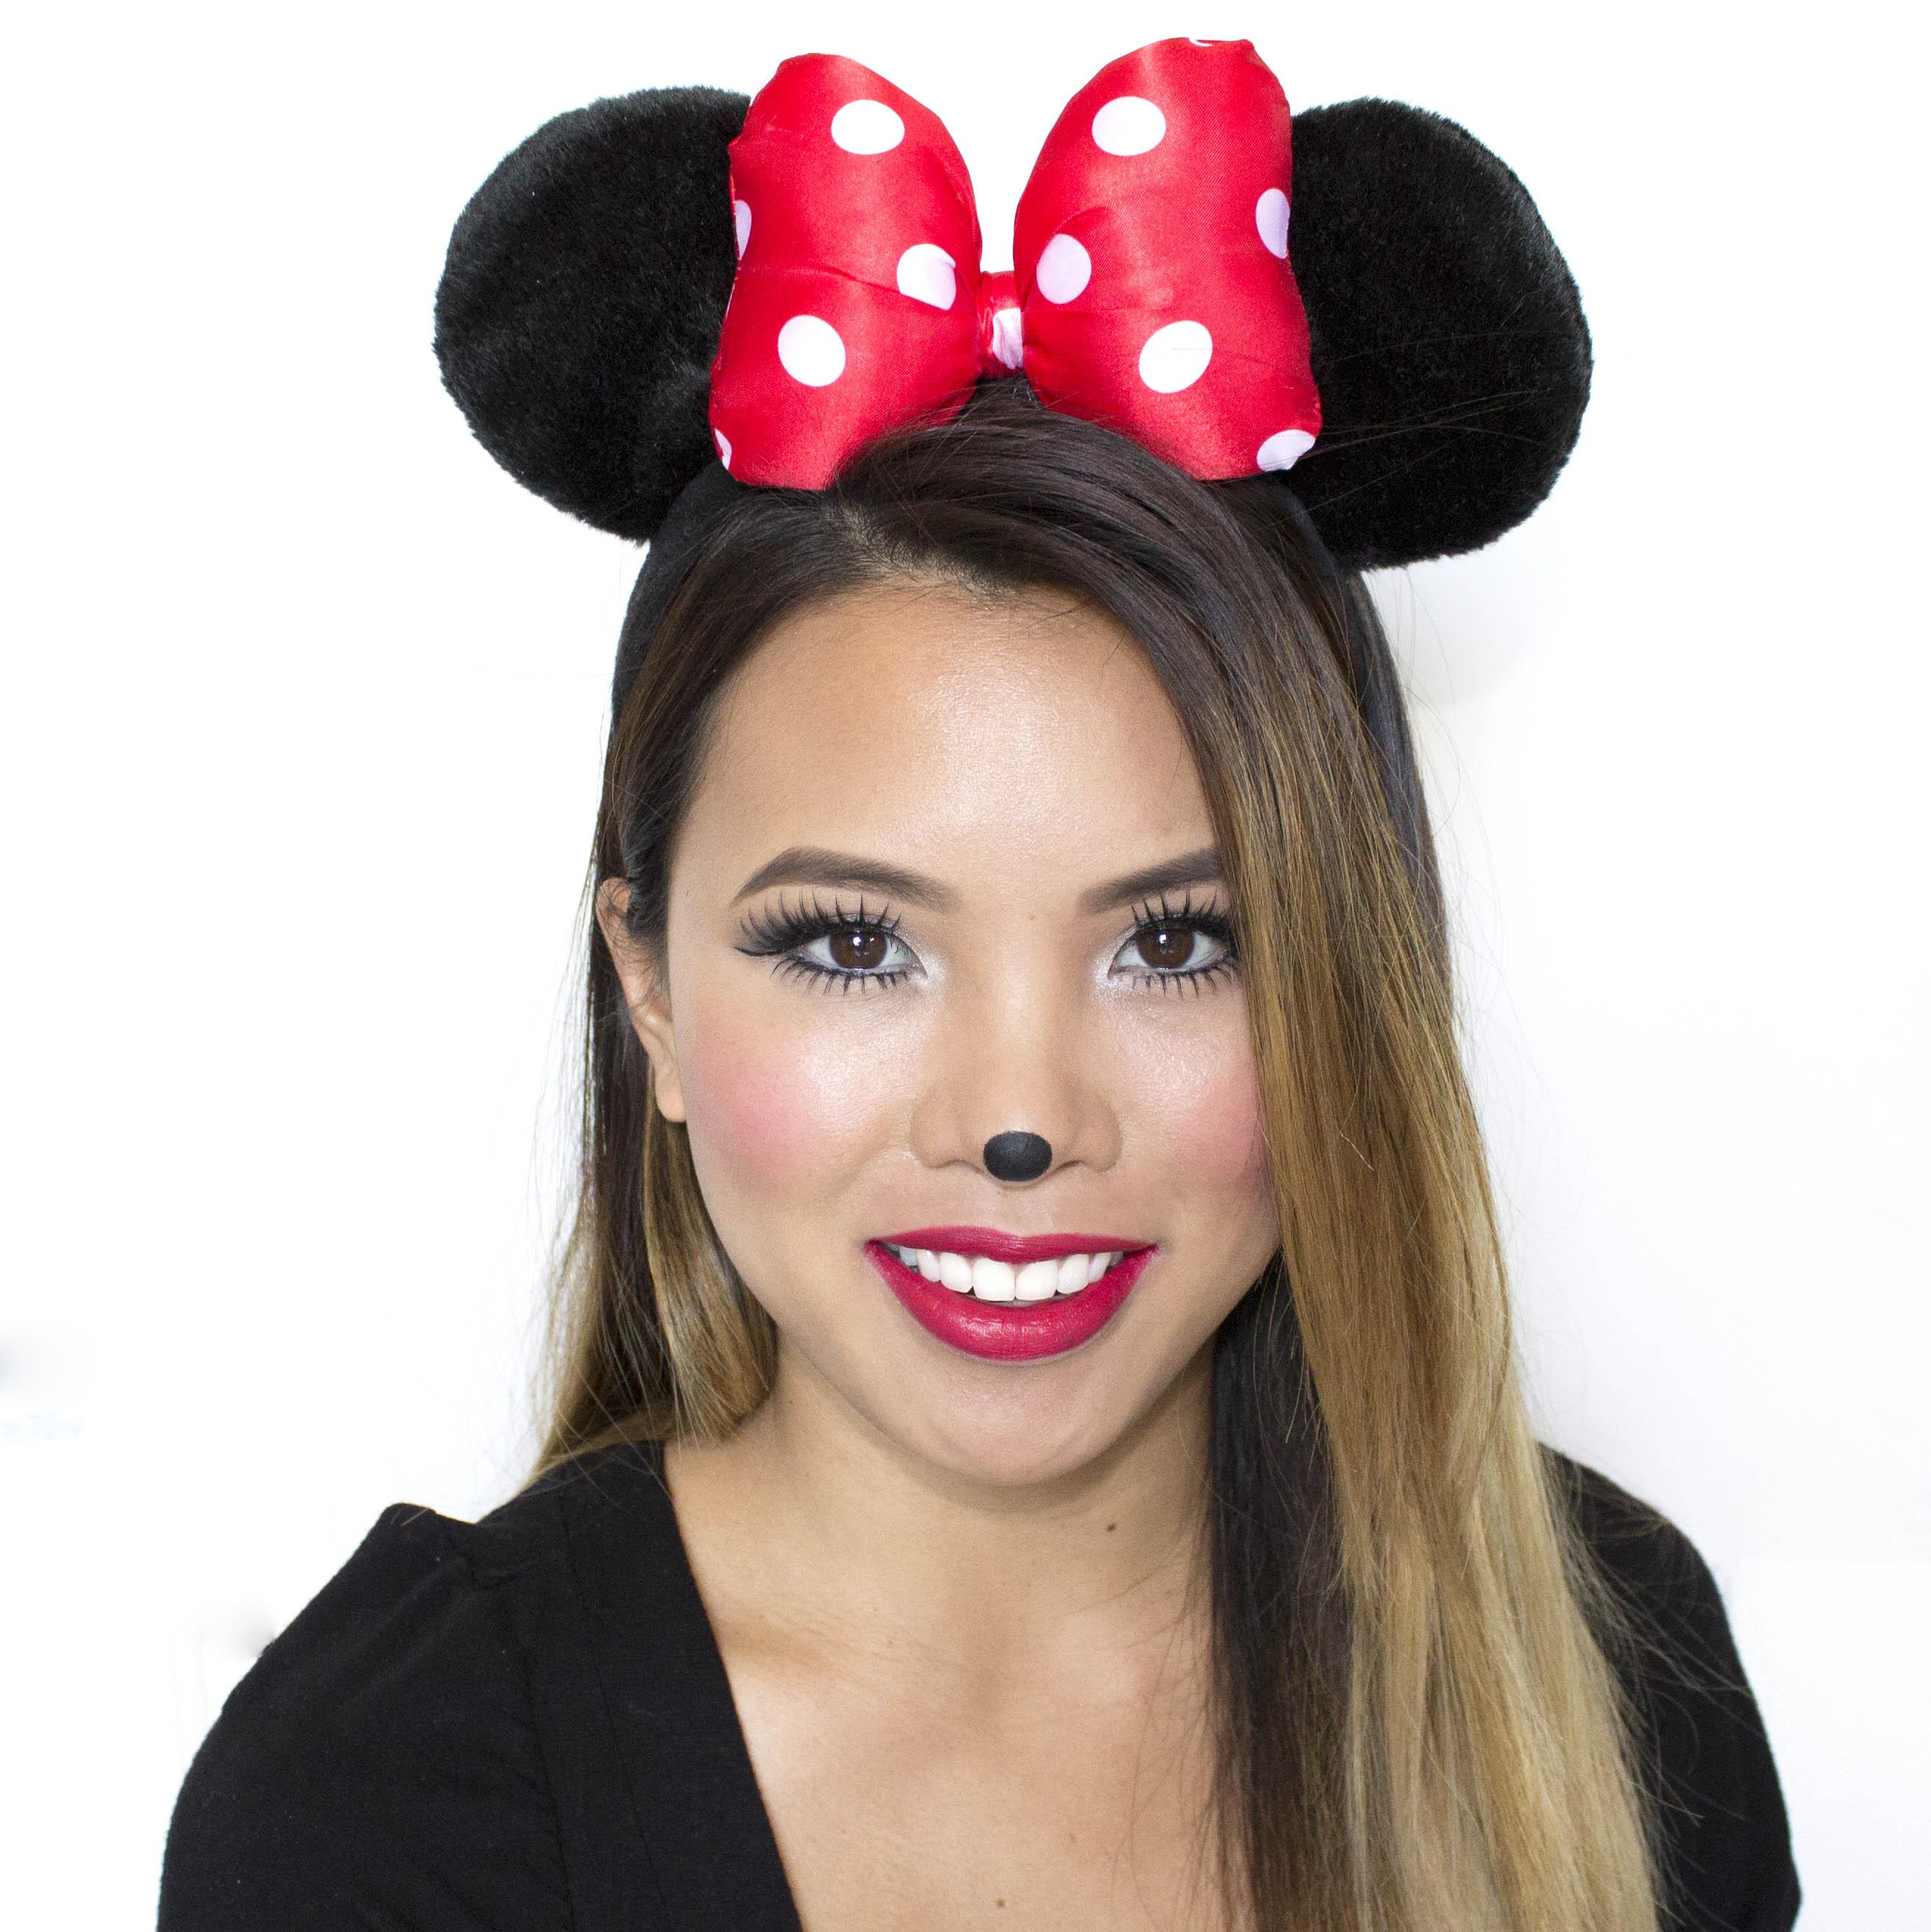 minnie mouse costume makeup ideas